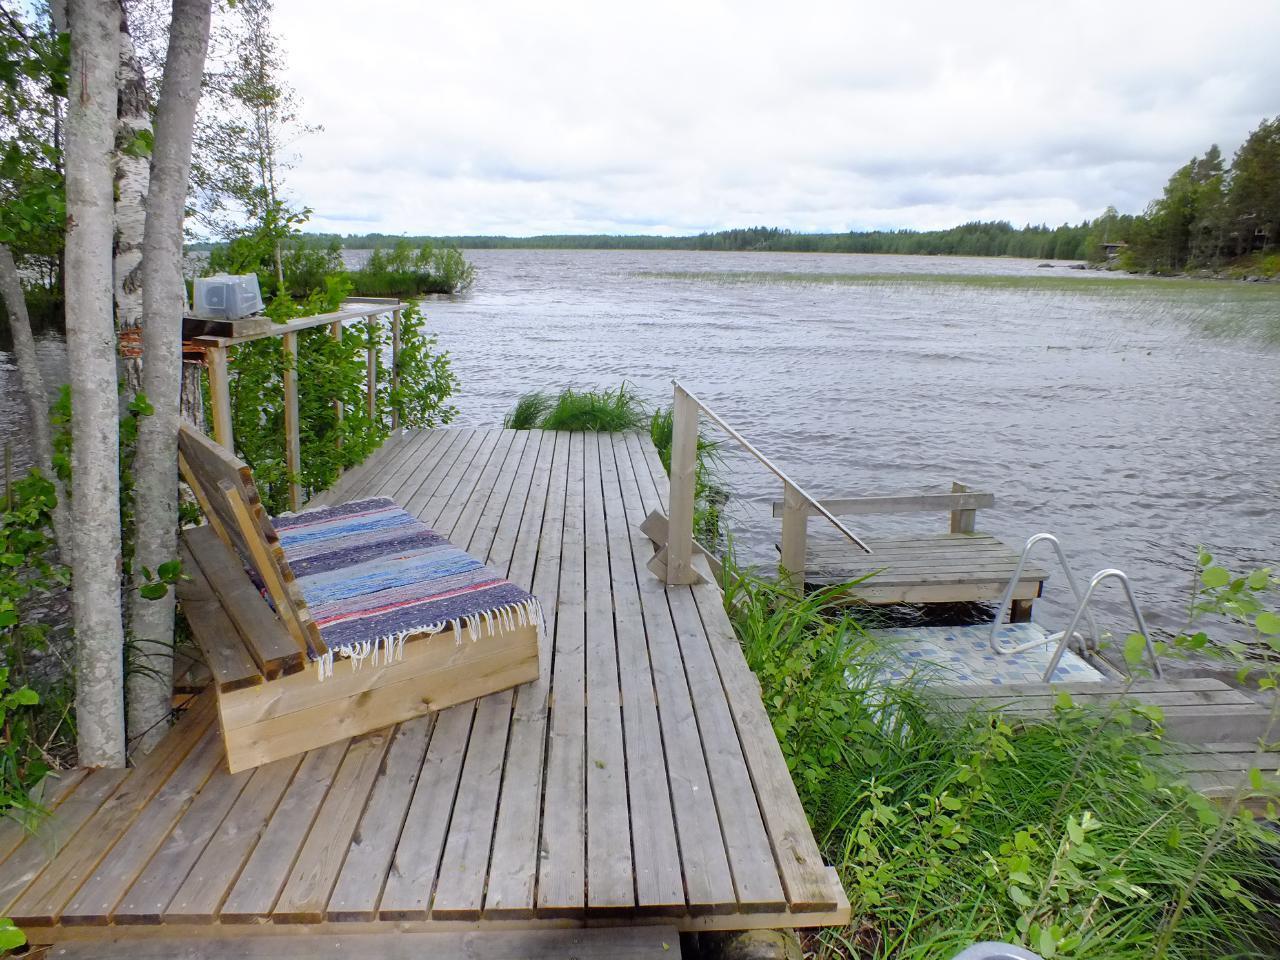 Ferienhaus - Mökki mit Sauna direkt am See  in Mouhijärvi-Sastamala (1707905), Mouhijärvi, , Westfinnland, Finnland, Bild 12